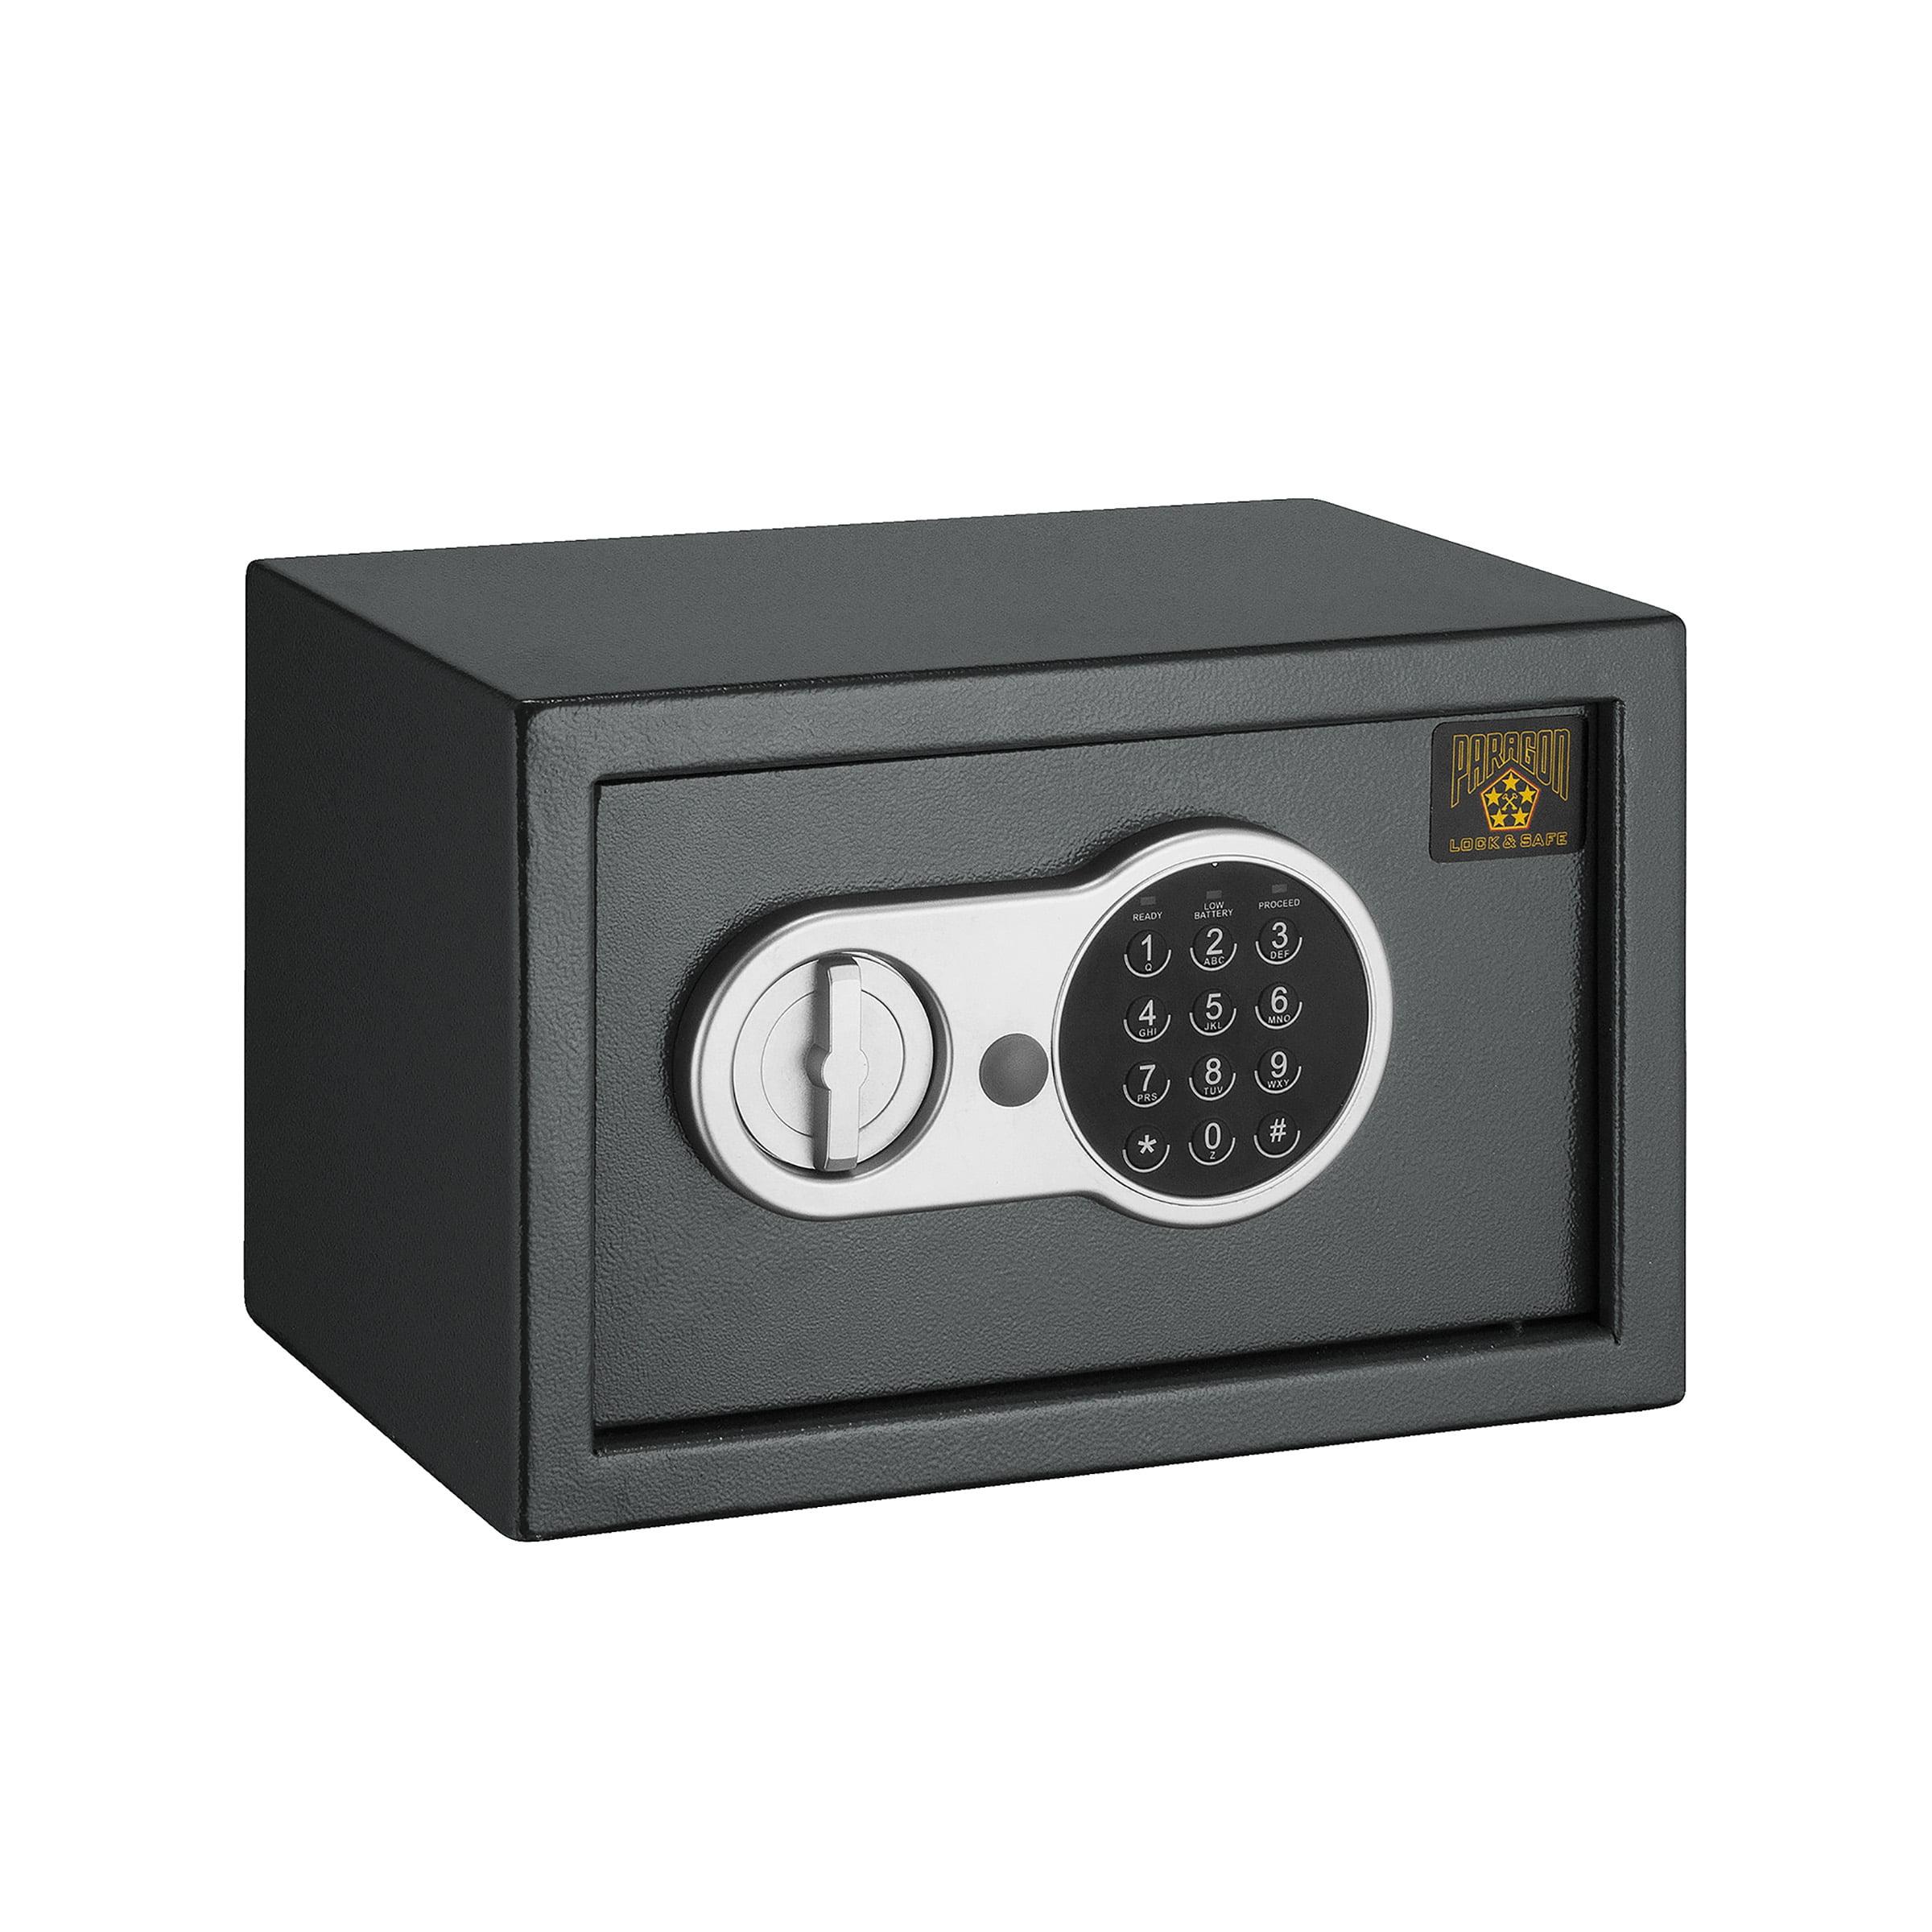 Paragon Lock & Safe Electronic .31 CF Digital Entry Safe for Home Security